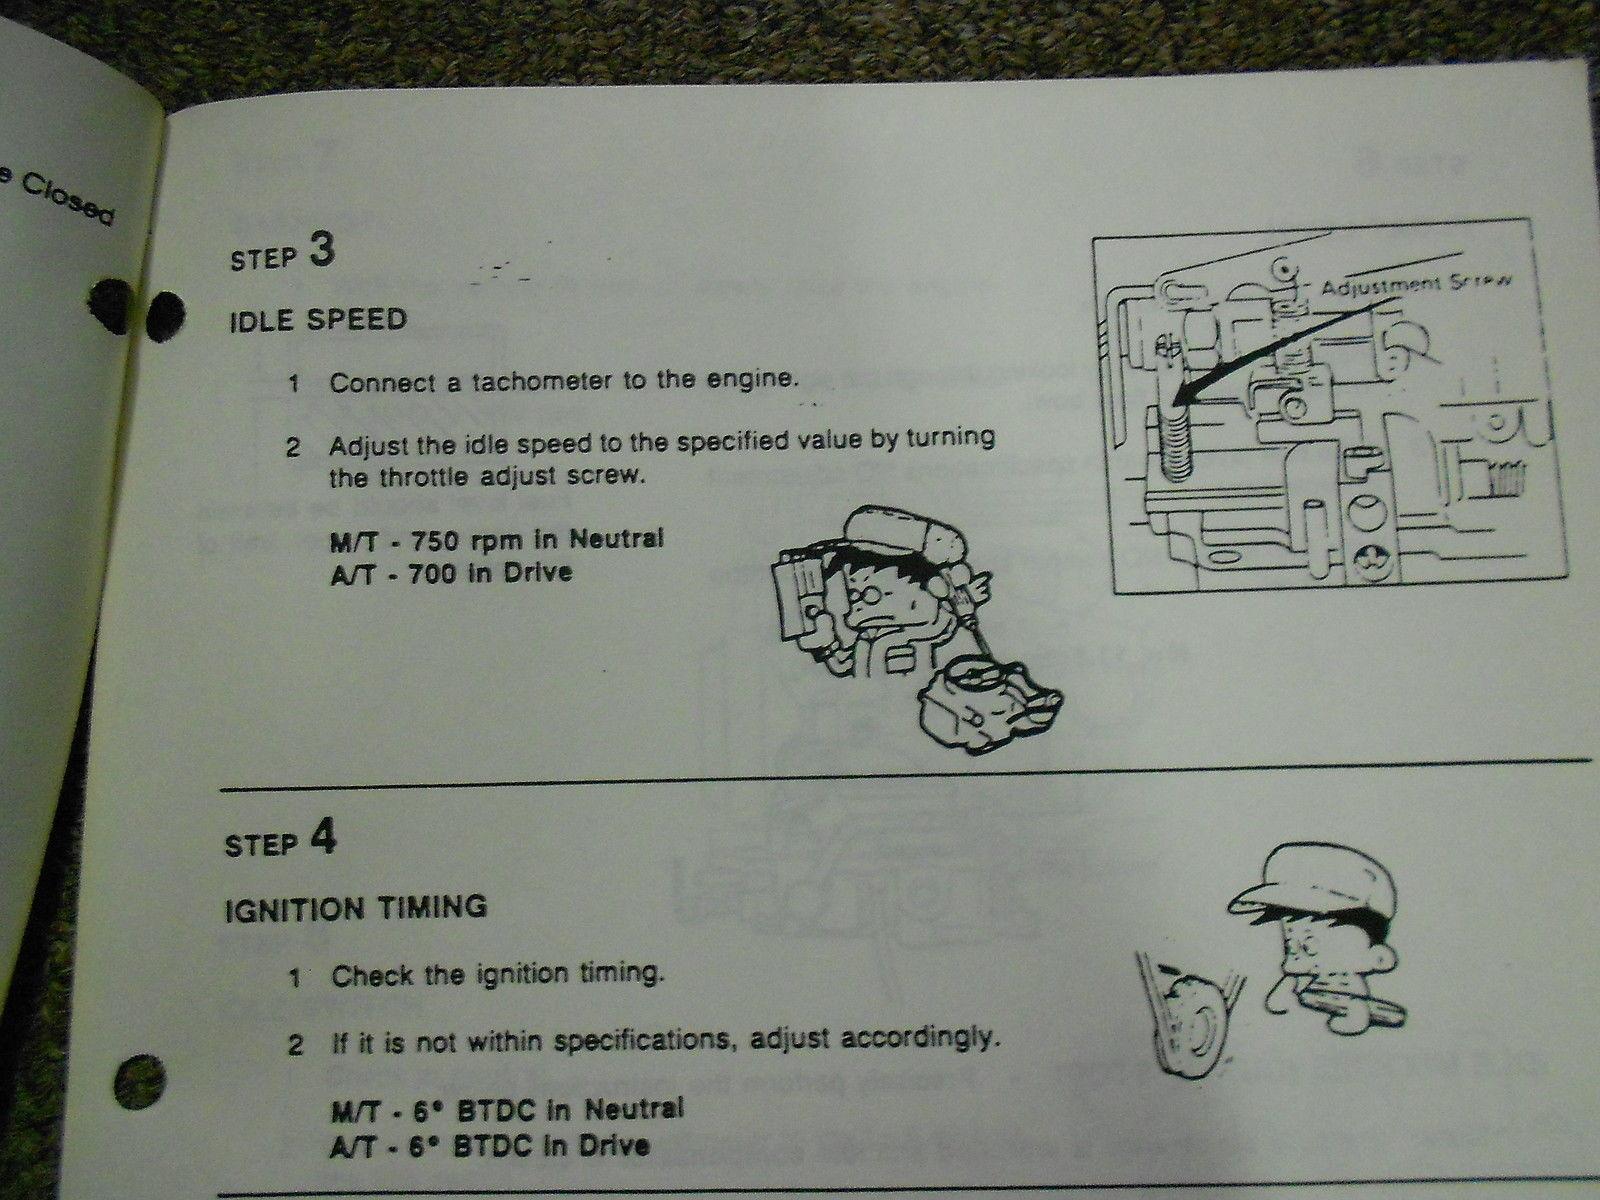 1985 mazda 626 engine diagram